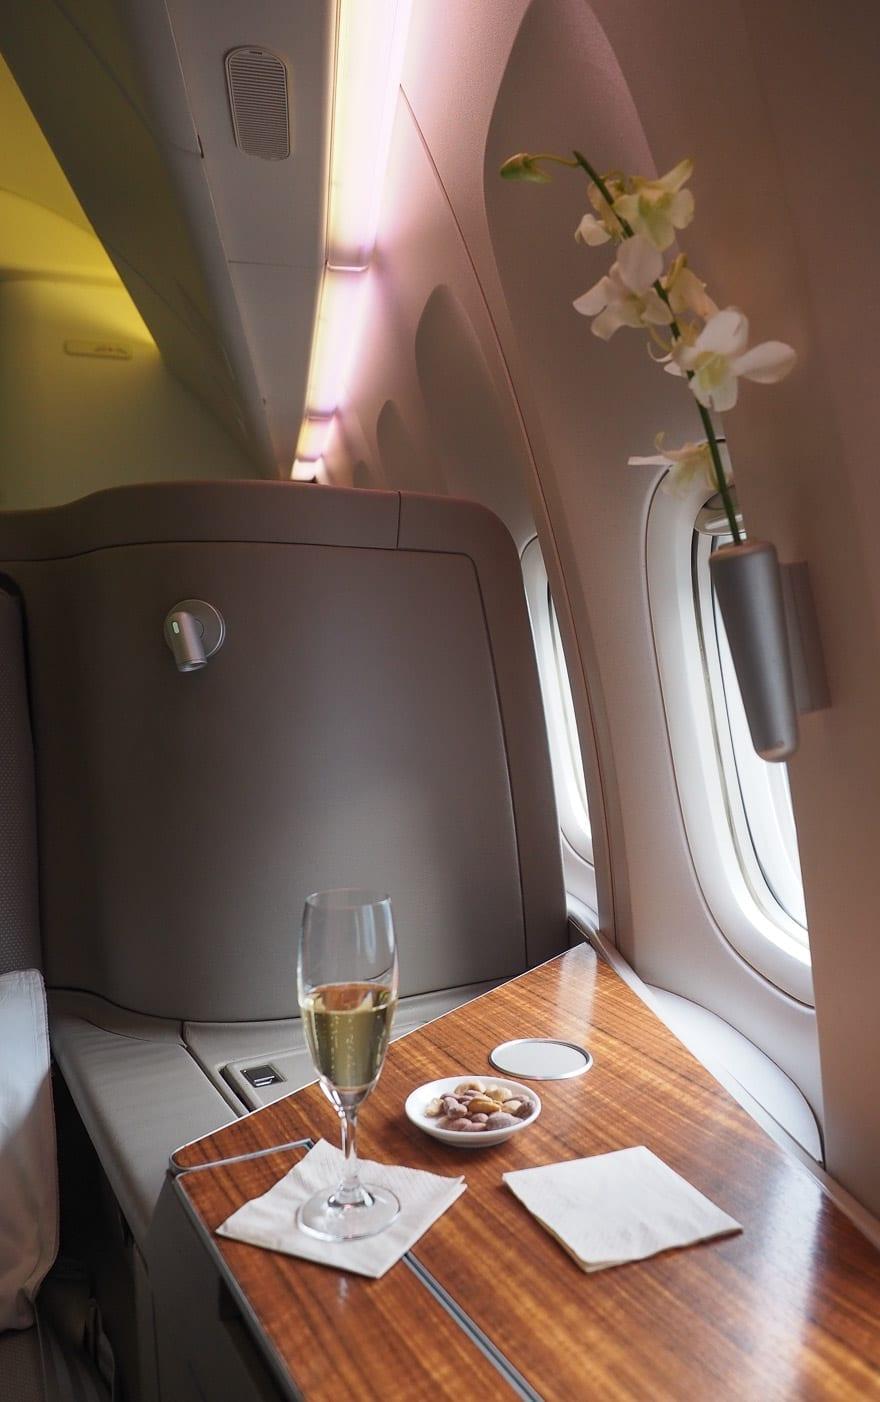 CX F MXP 5 - REVIEW - Cathay Pacific : First Class - B777 - Milan (MXP) to Hong Kong (HKG)